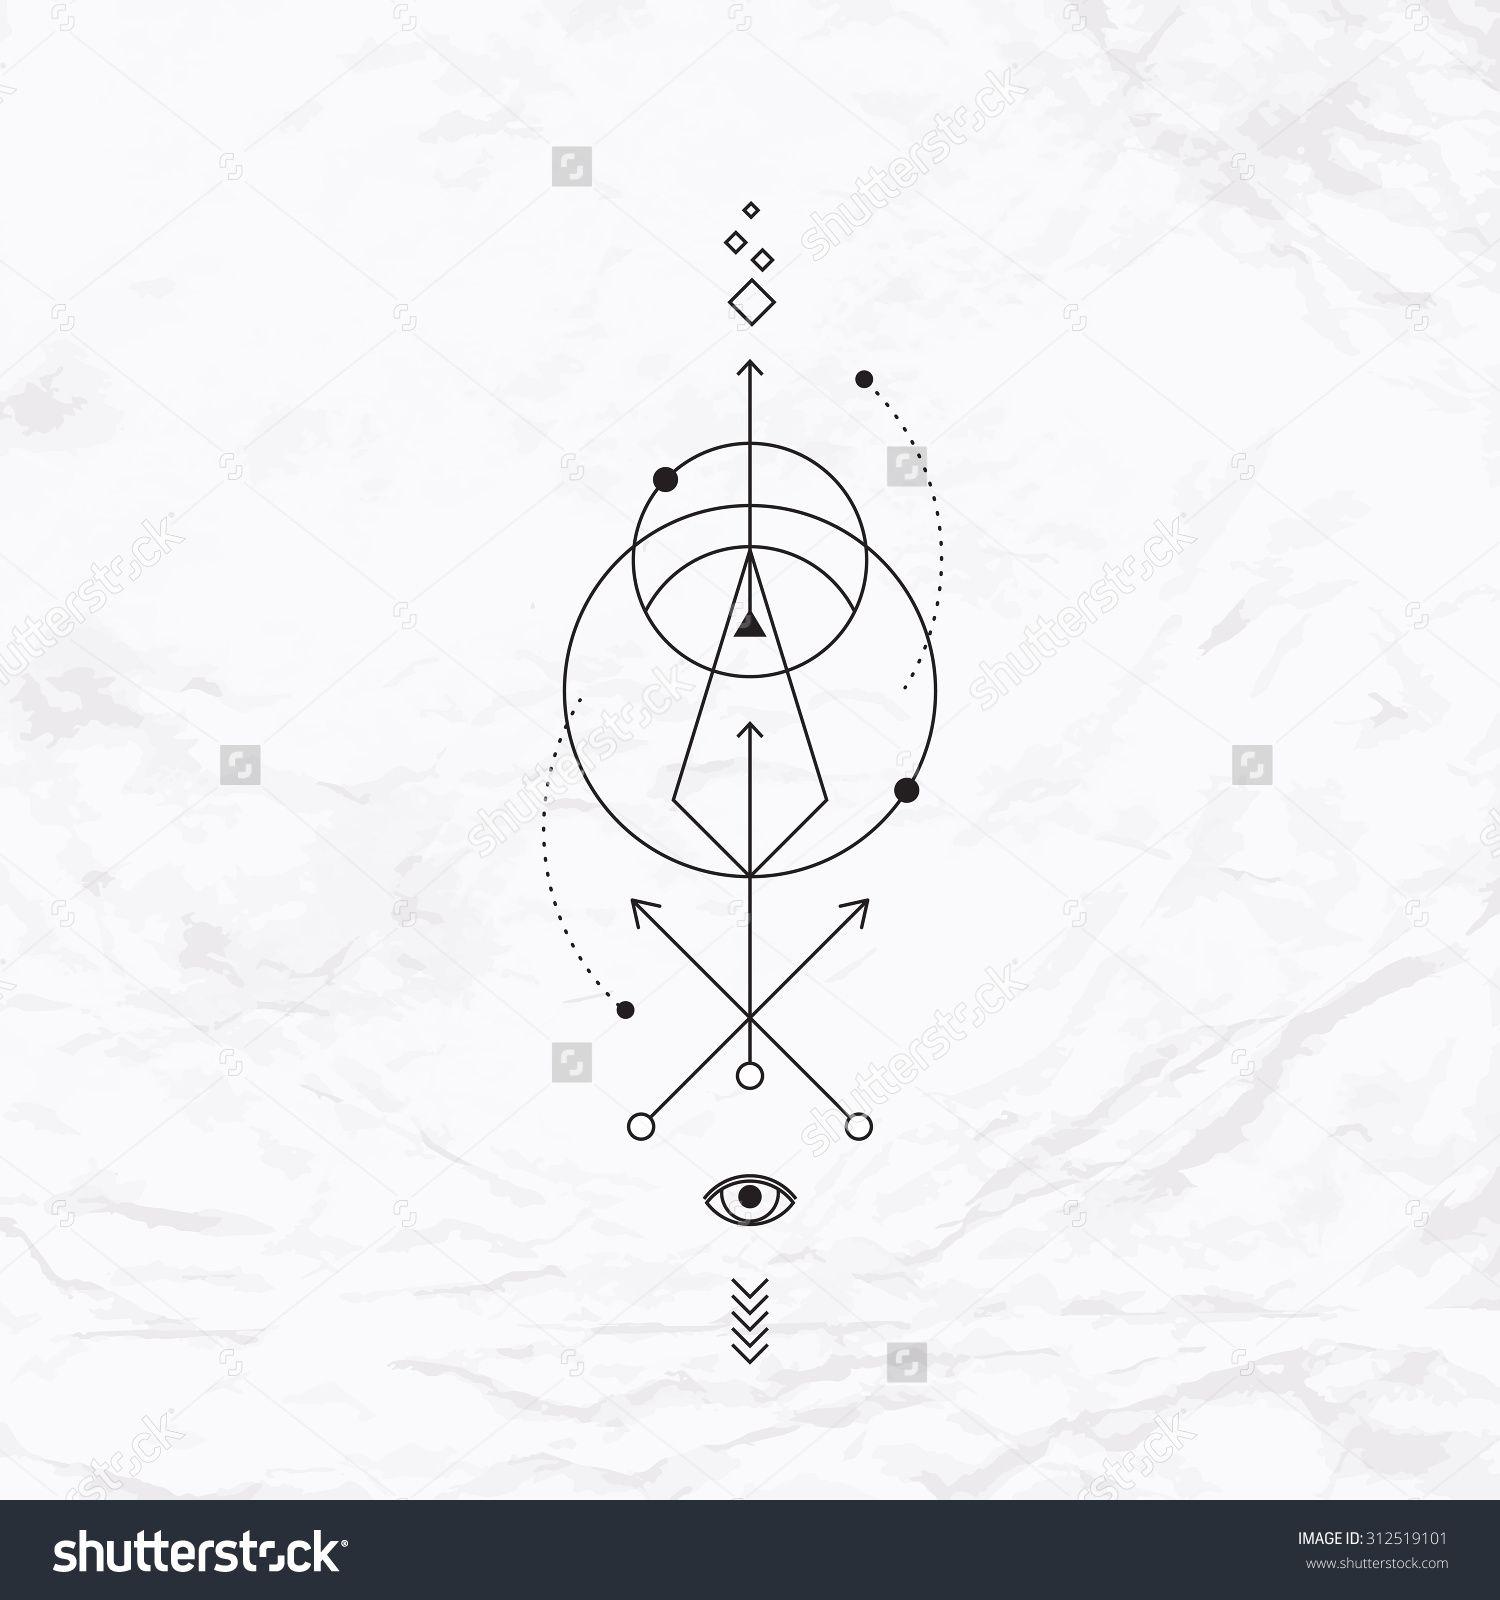 alchemy circle tattoo design photo 4 geometrical